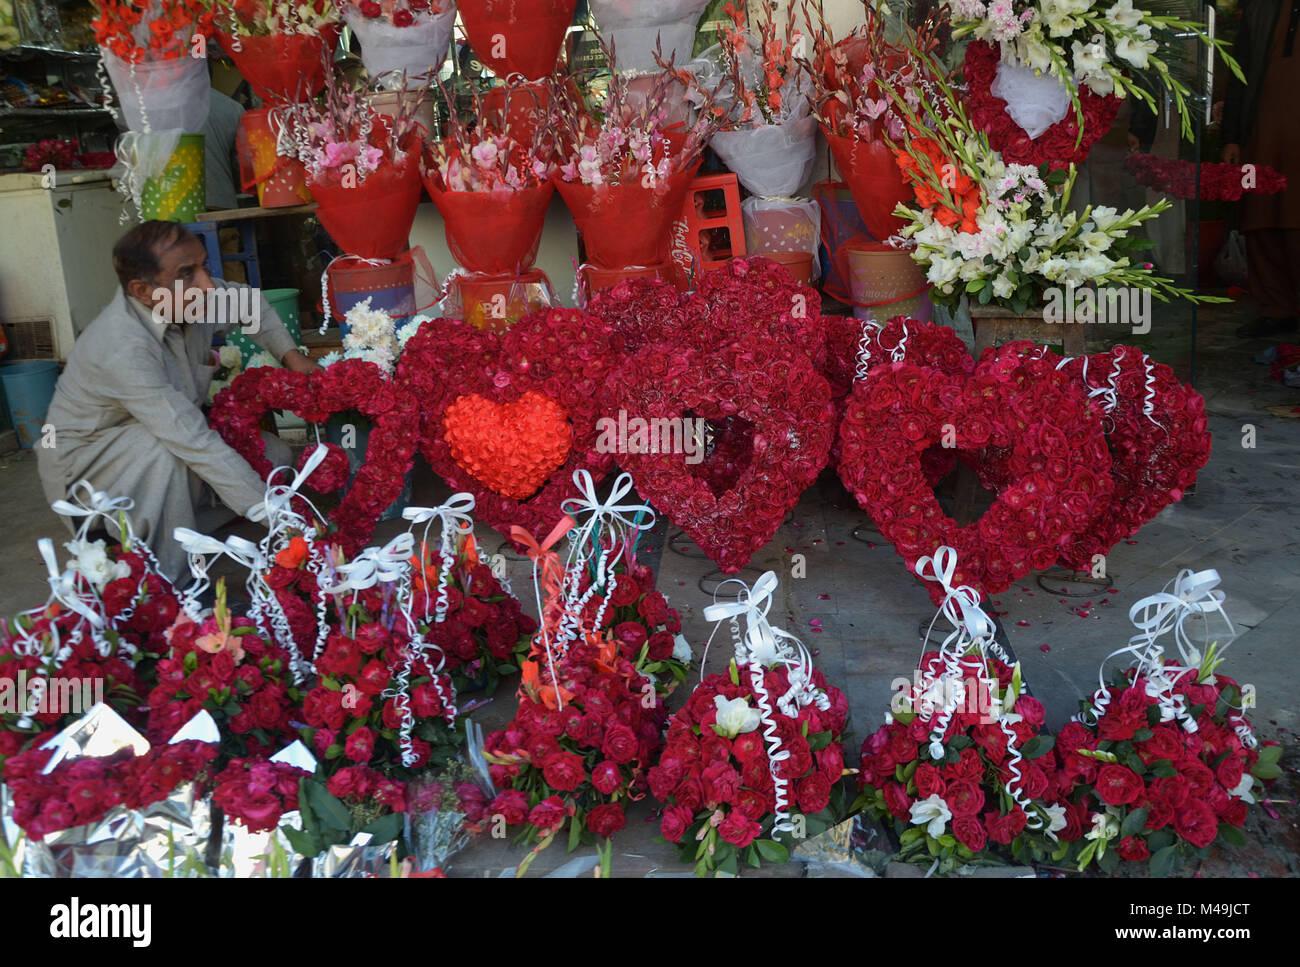 Pakistani people purchasing fresh roses flowers bouquets and pakistani people purchasing fresh roses flowers bouquets and garlands m49jctg izmirmasajfo Images